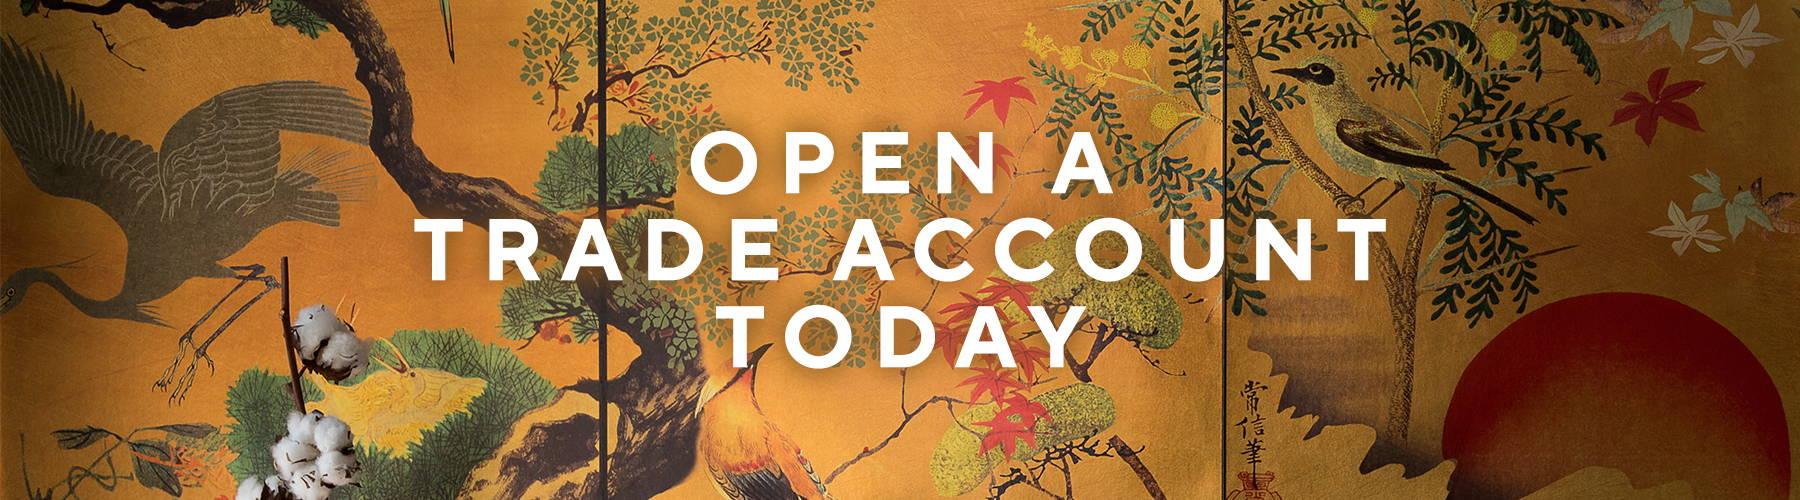 Open a trade account today